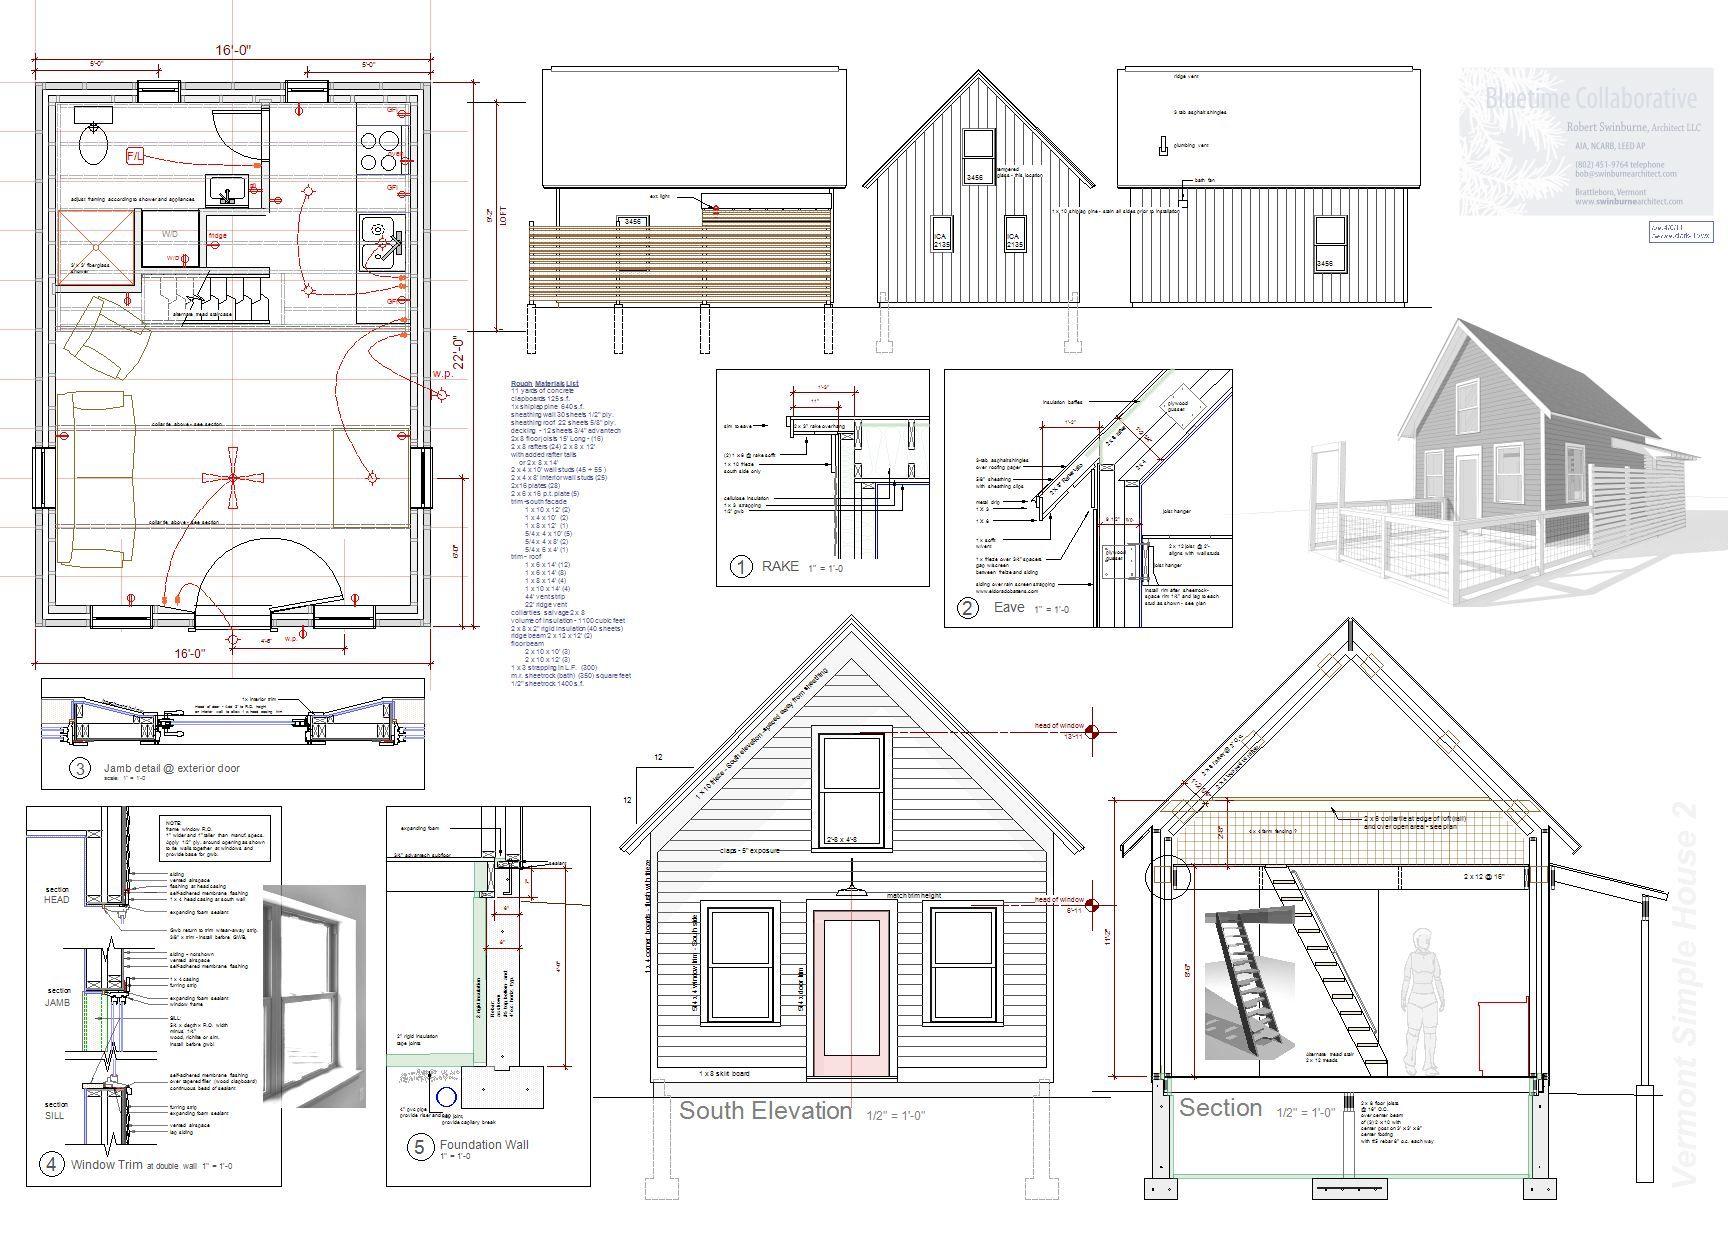 Astounding 17 Best Images About Tiny House Plans Design Ideas On Pinterest Largest Home Design Picture Inspirations Pitcheantrous